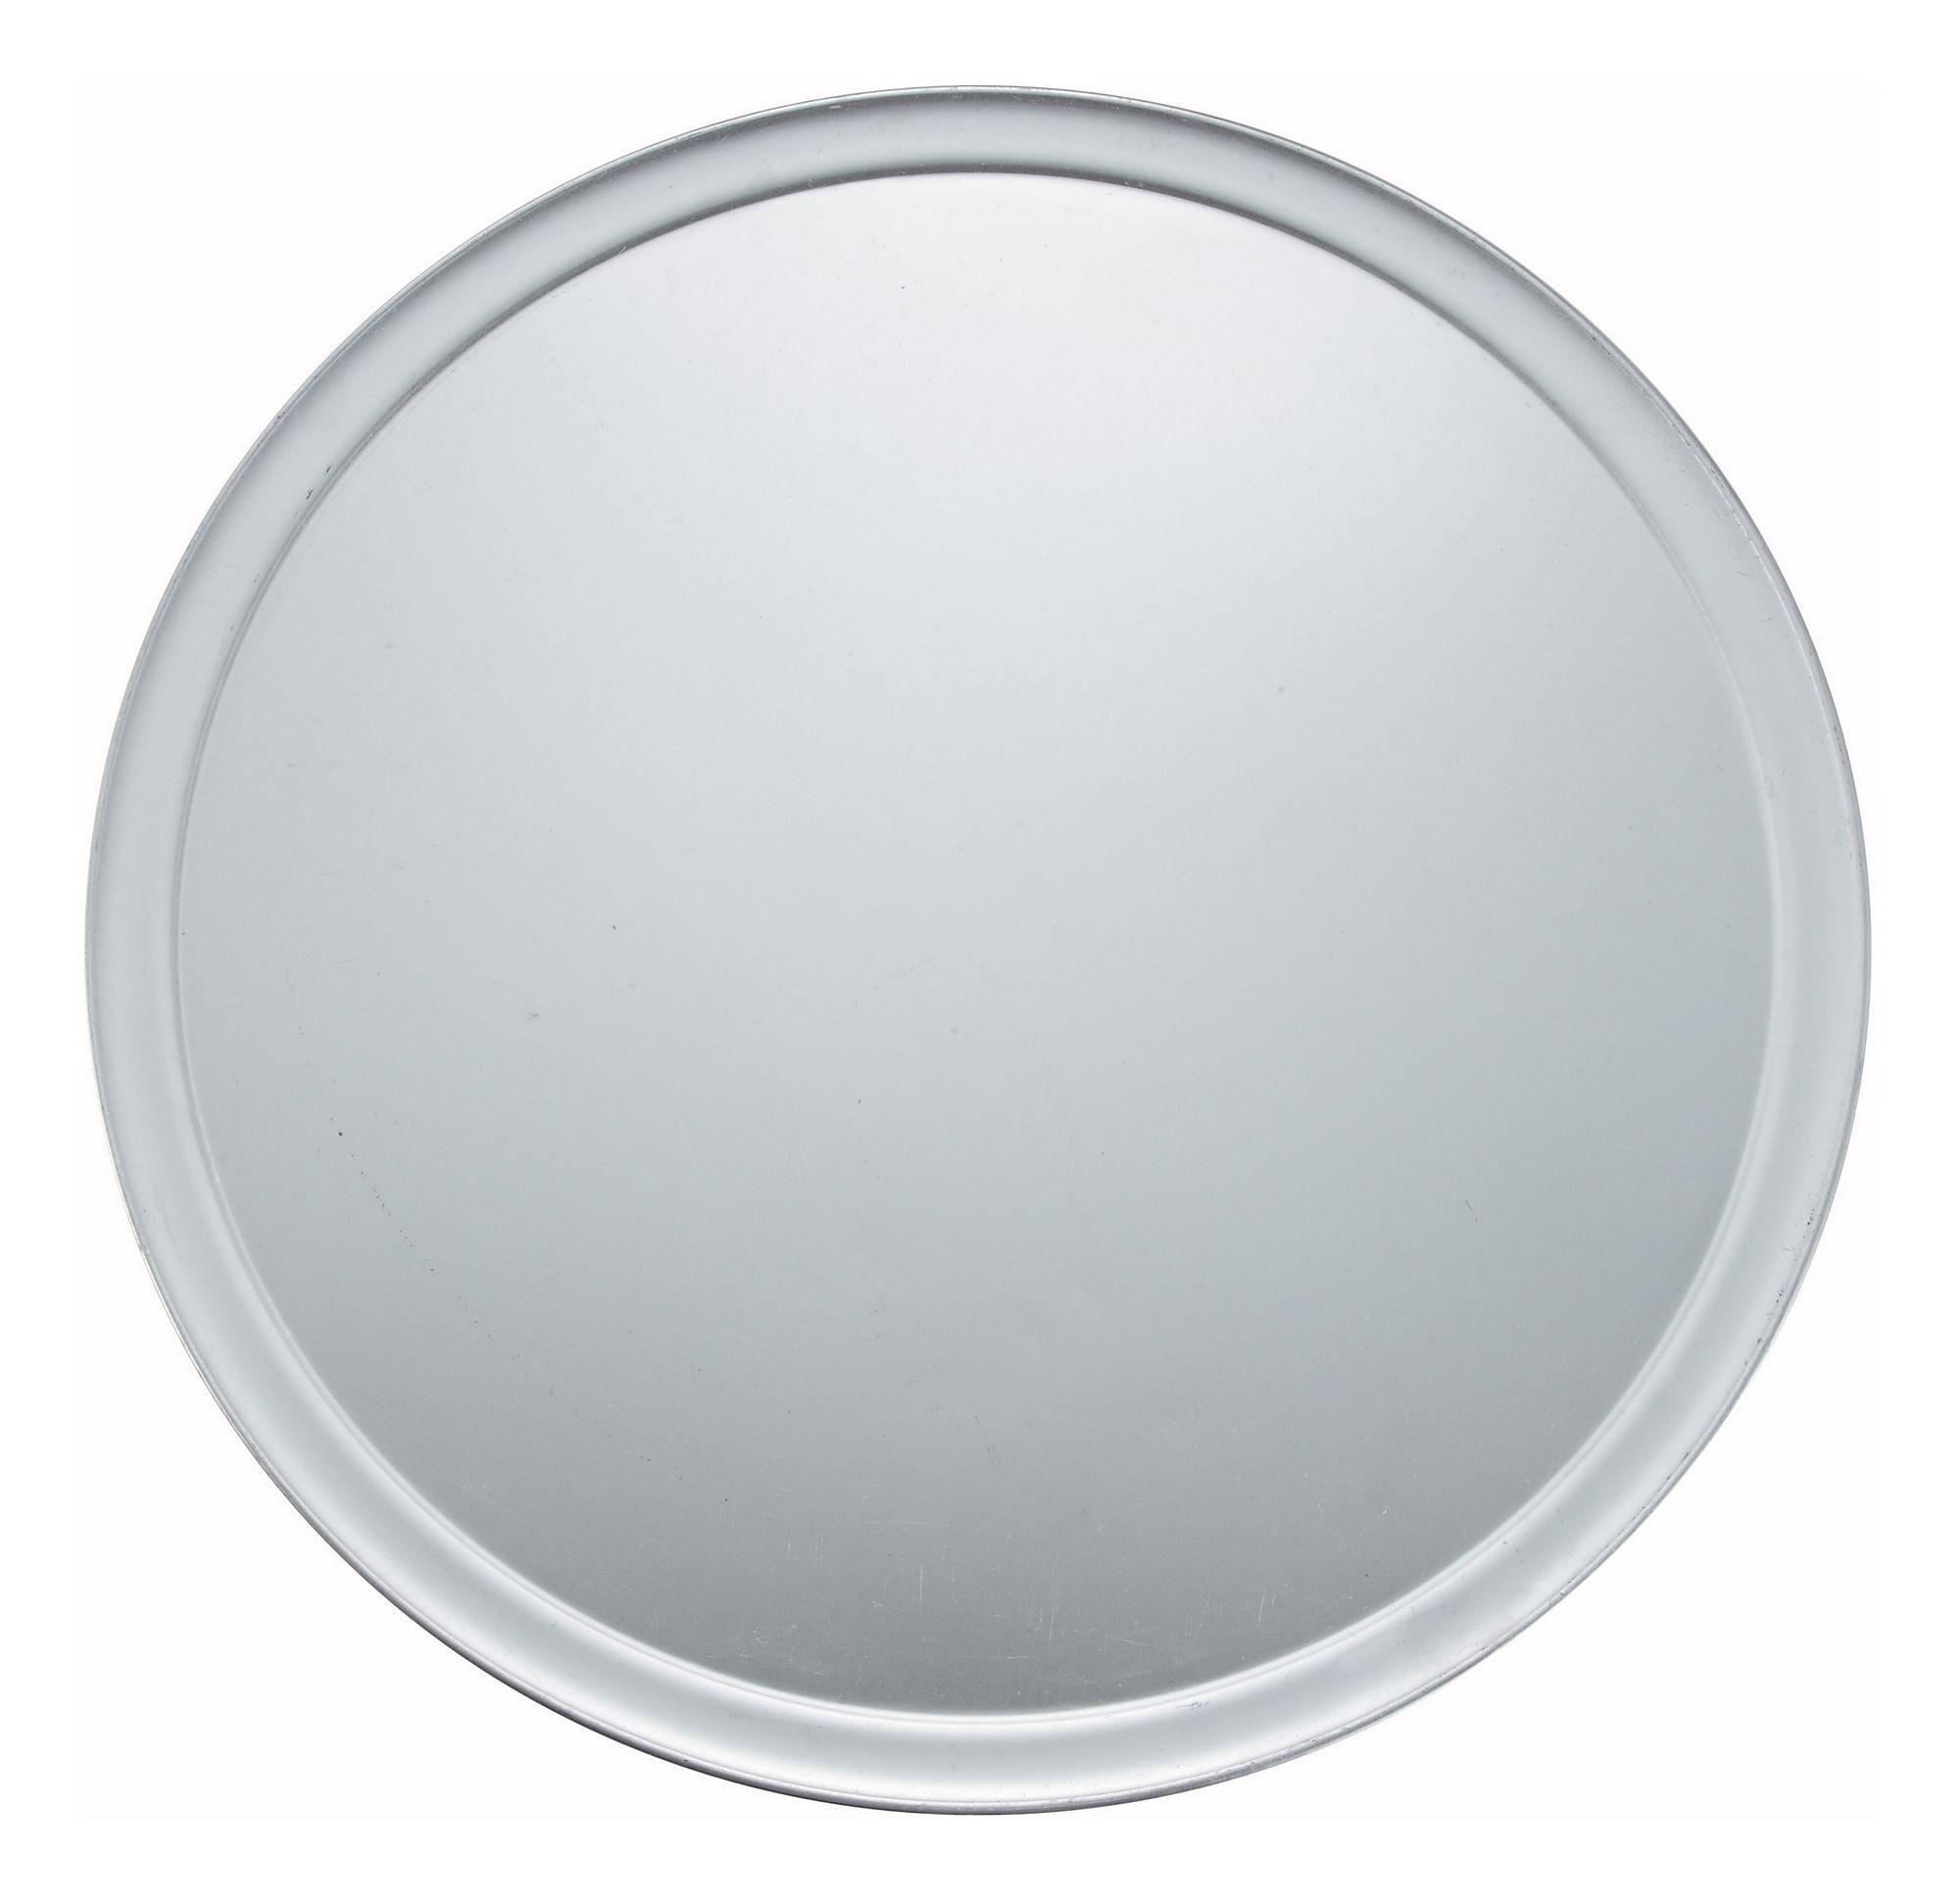 "Winco APZT-17 Wide-Rimmed Aluminum Pizza Pan 17"" Dia."